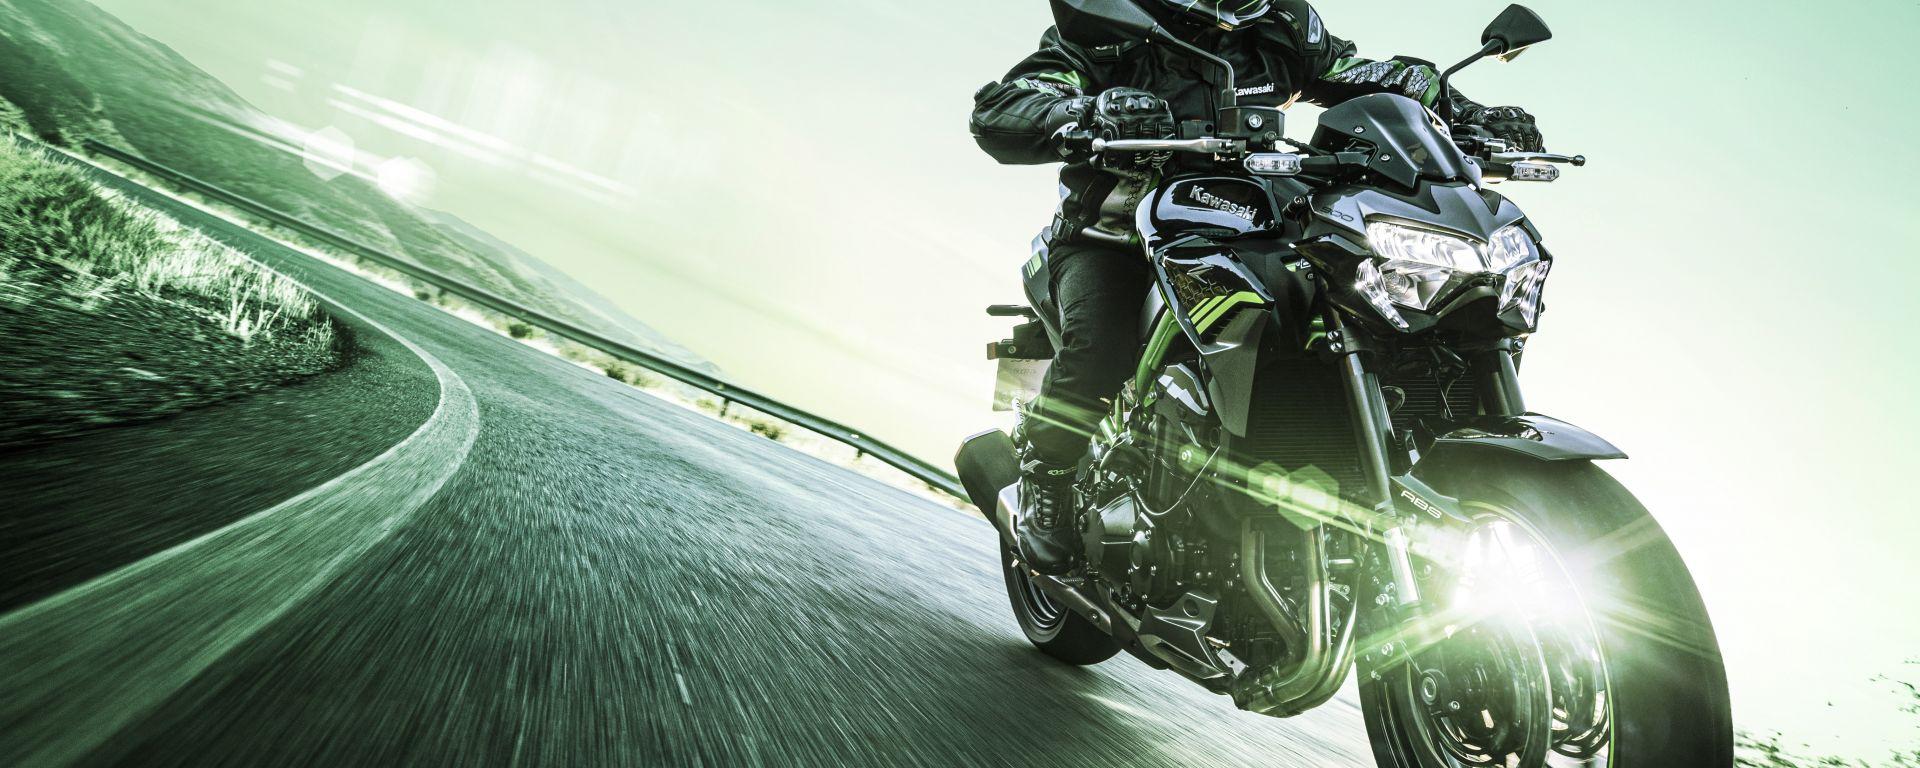 Kawasaki al Motor Bike Expo